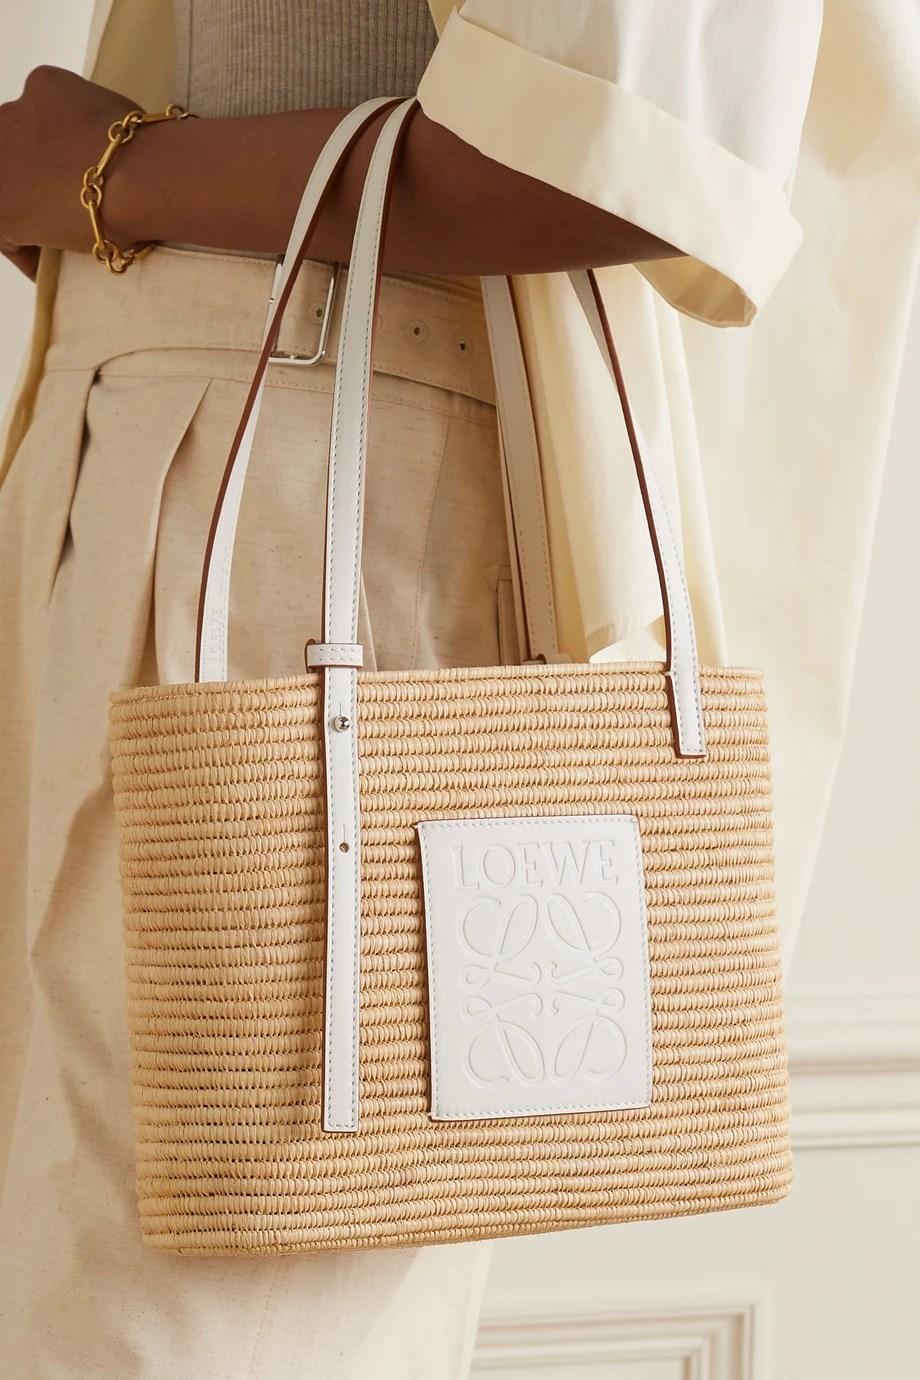 Designer Straw Bags